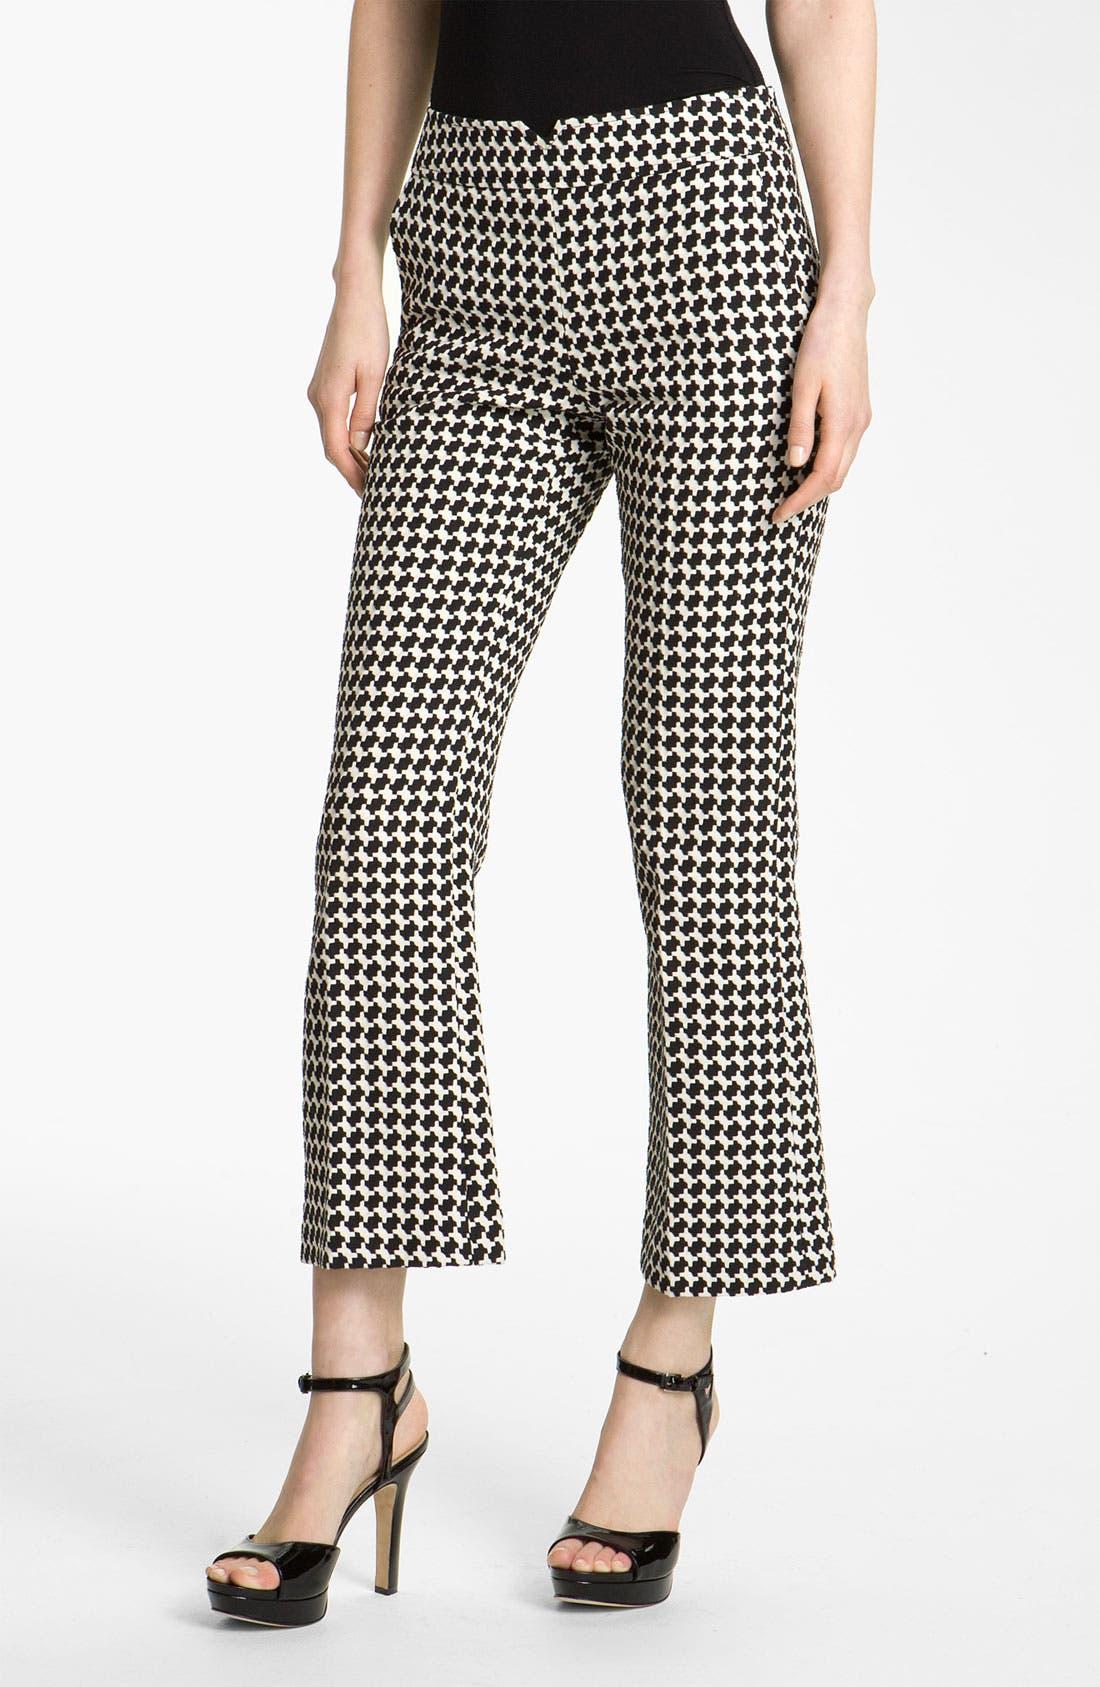 Alternate Image 1 Selected - Trina Turk 'Fez' Crop Pants